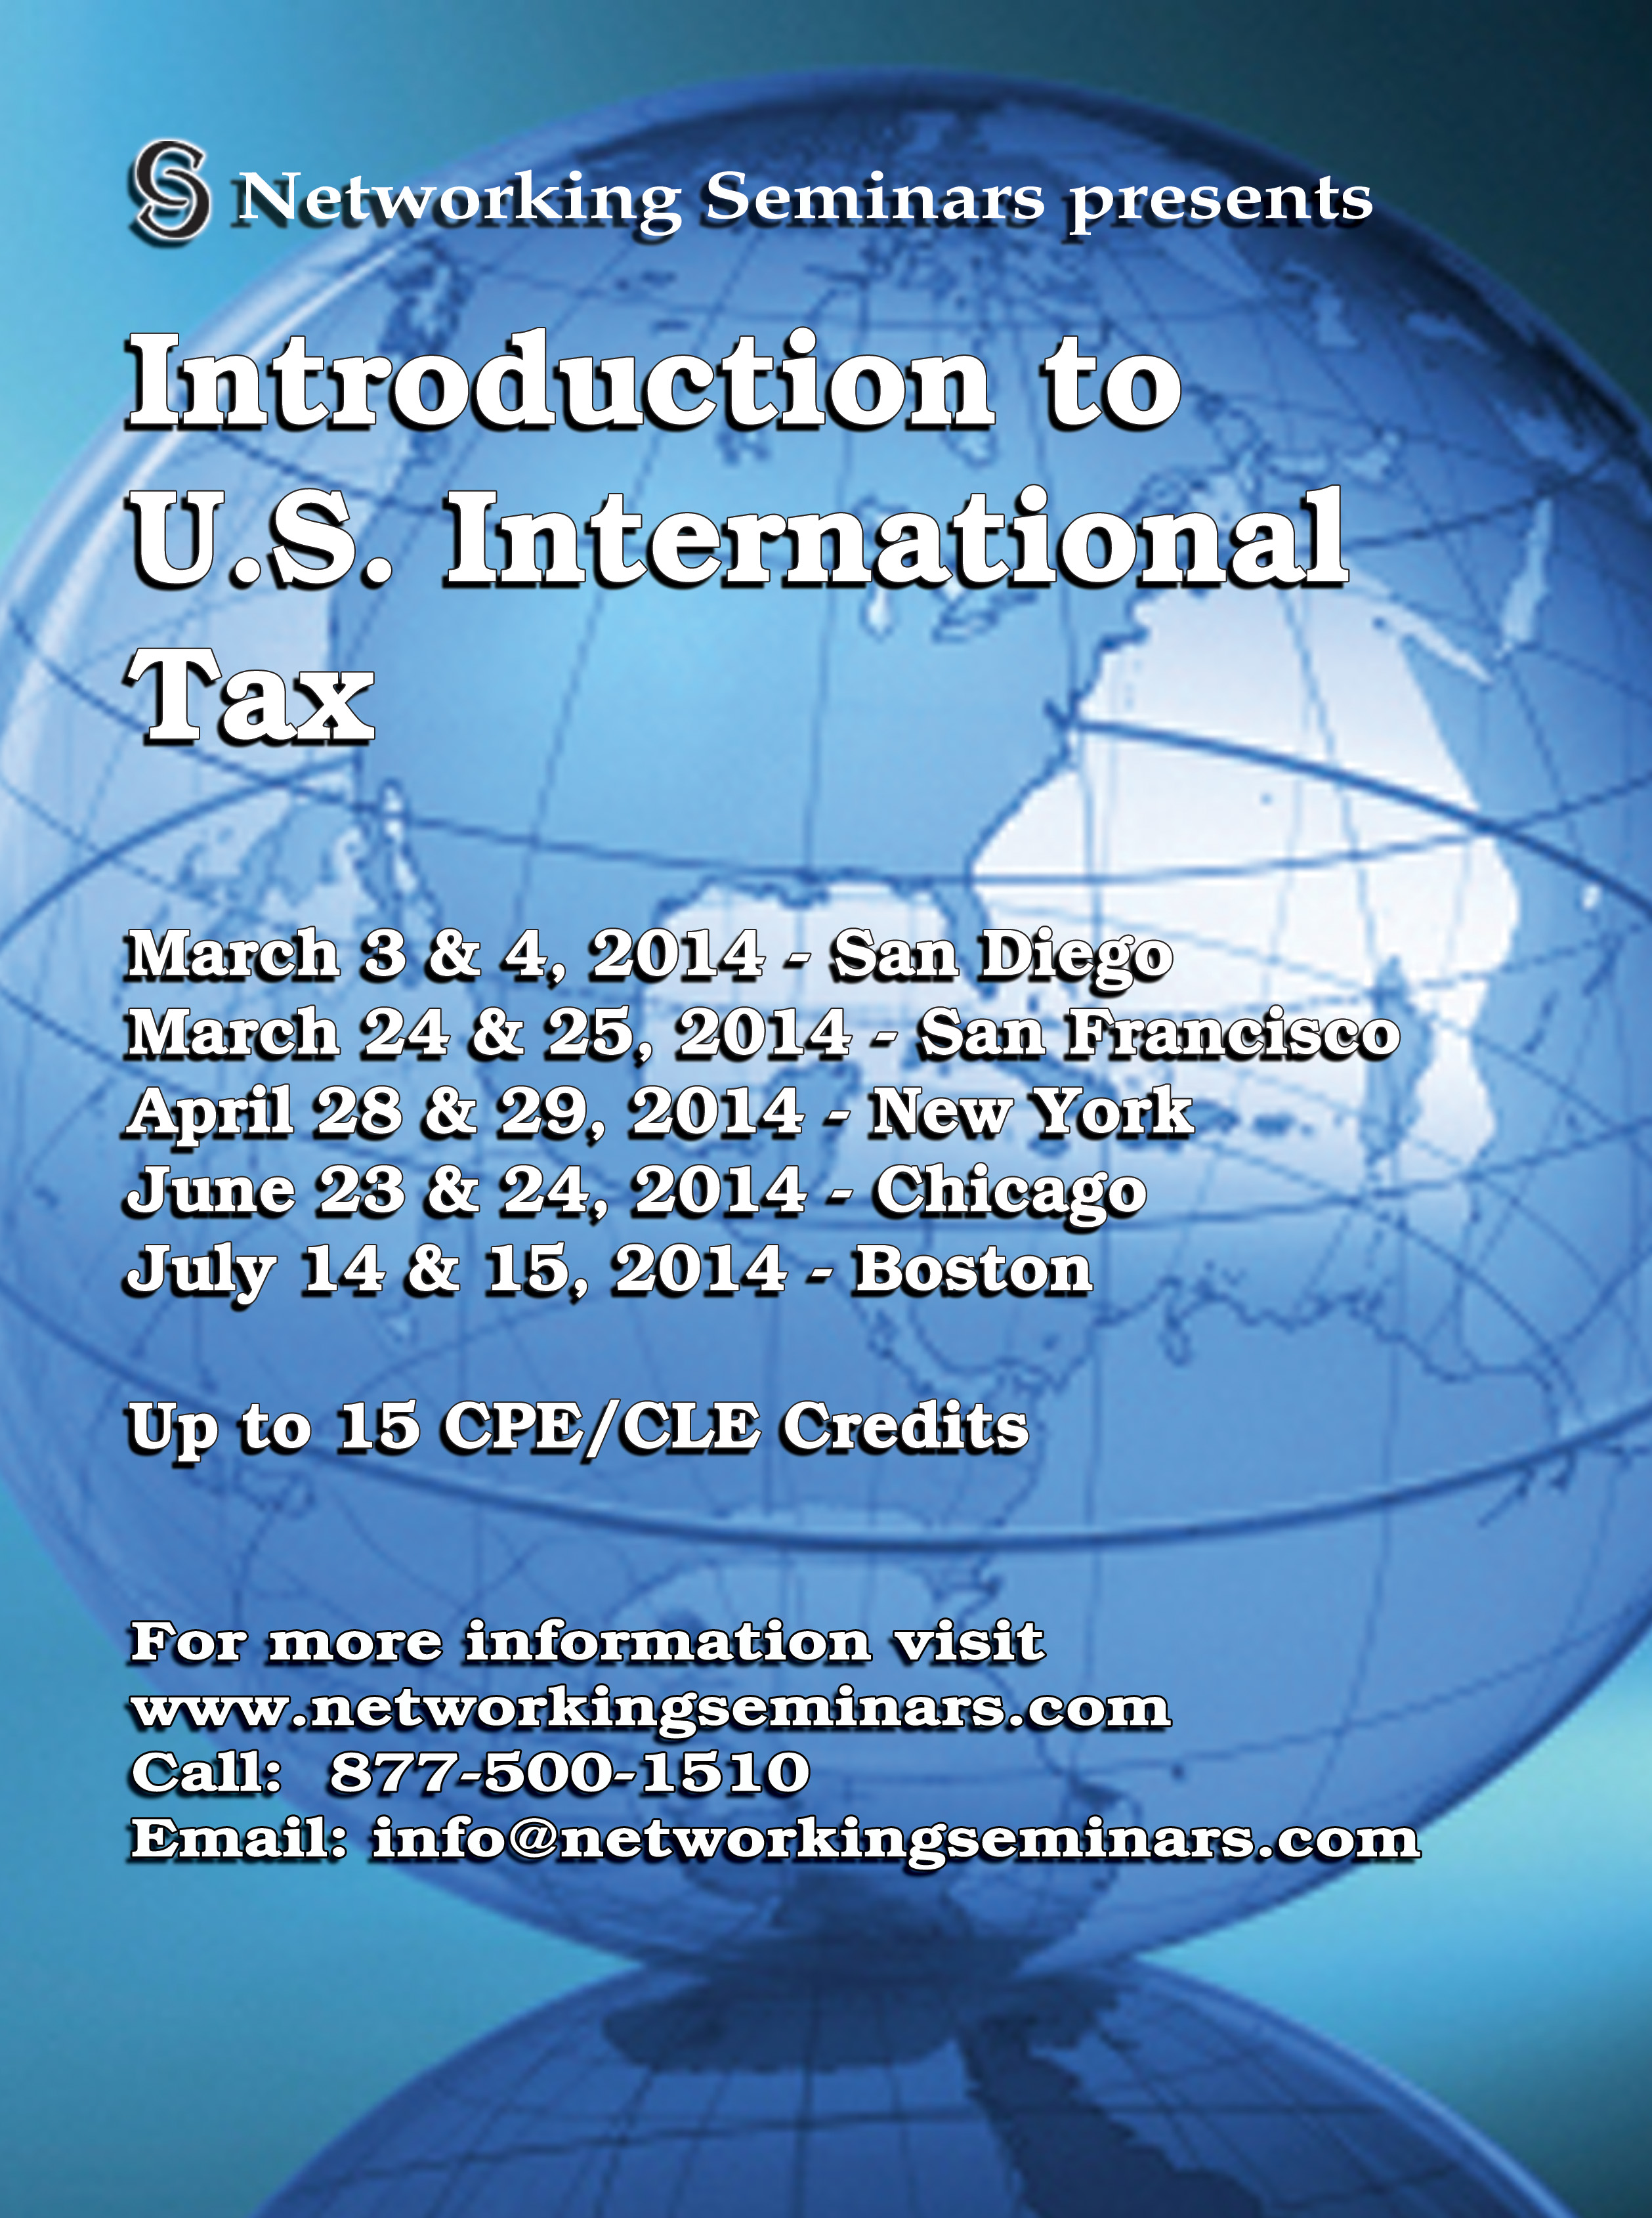 Introduction to U.S International Tax Seminar